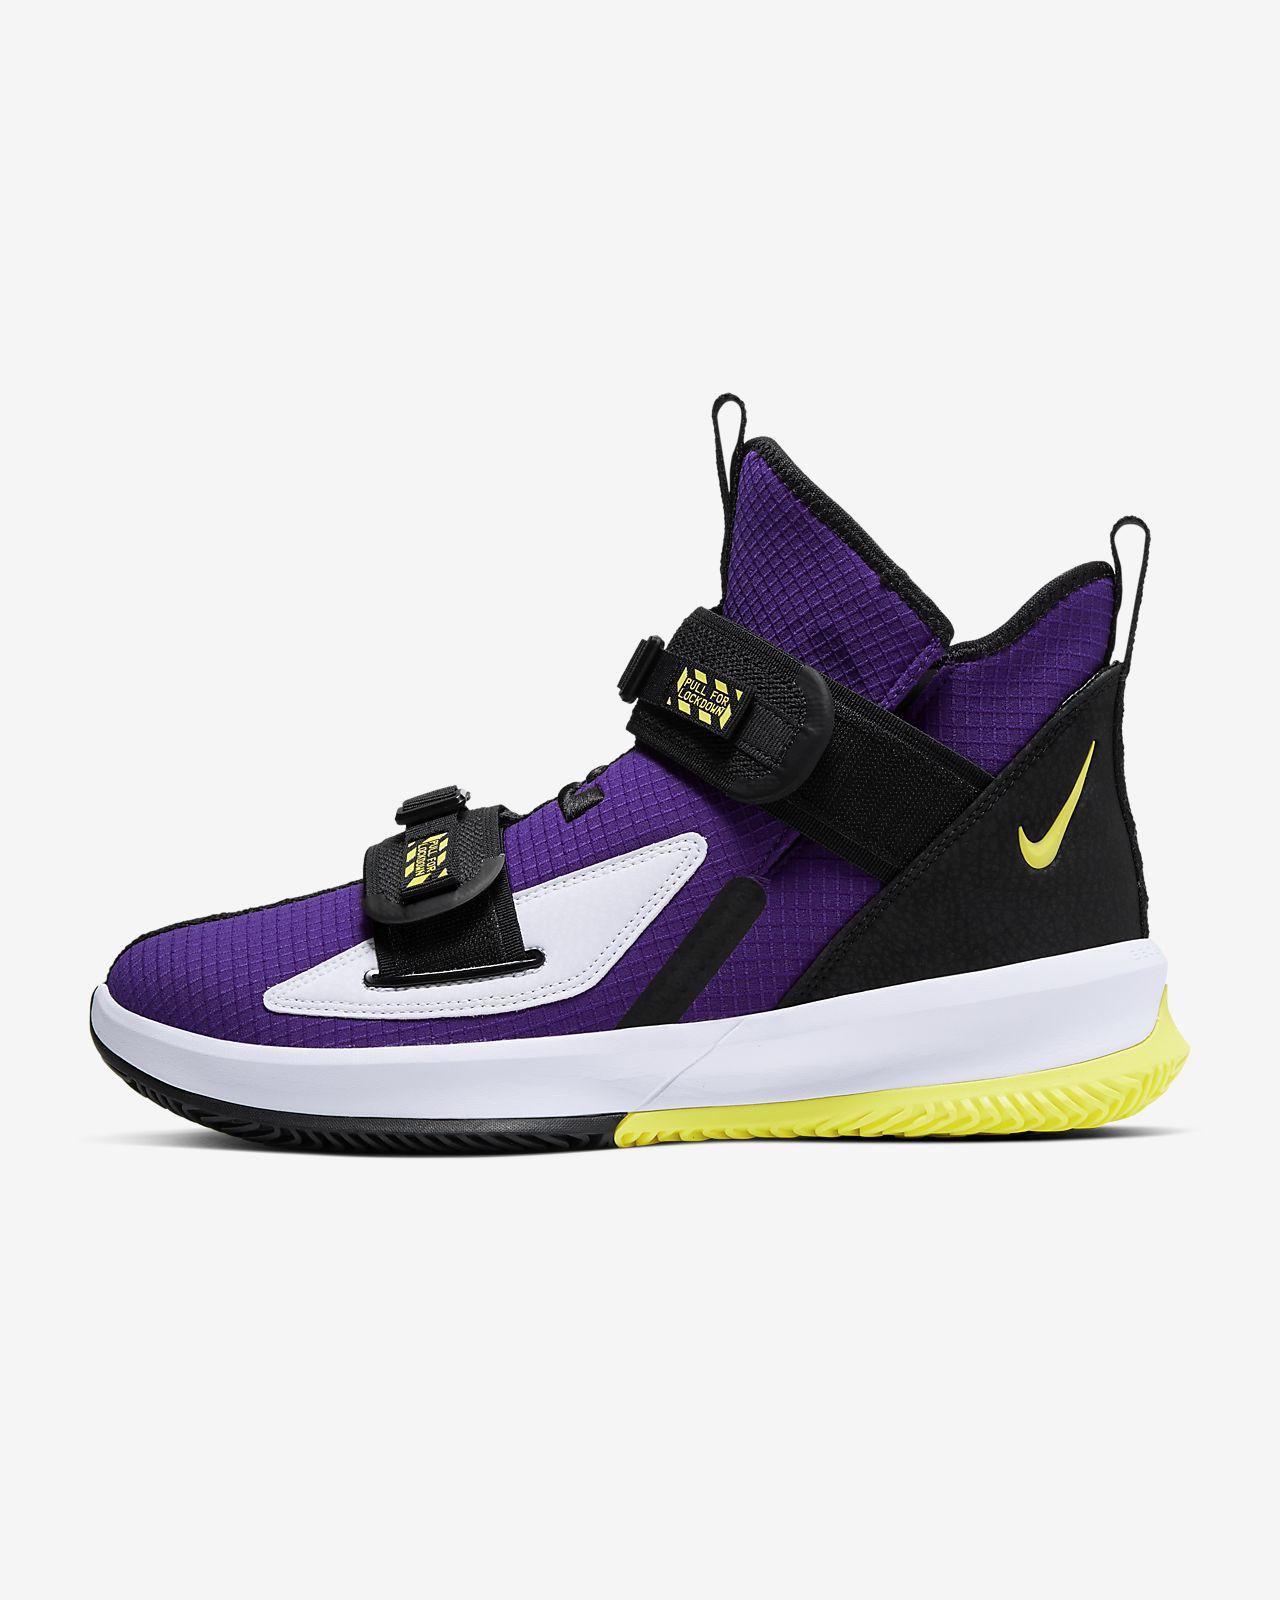 LeBron Soldier 13 SFG EP 籃球鞋